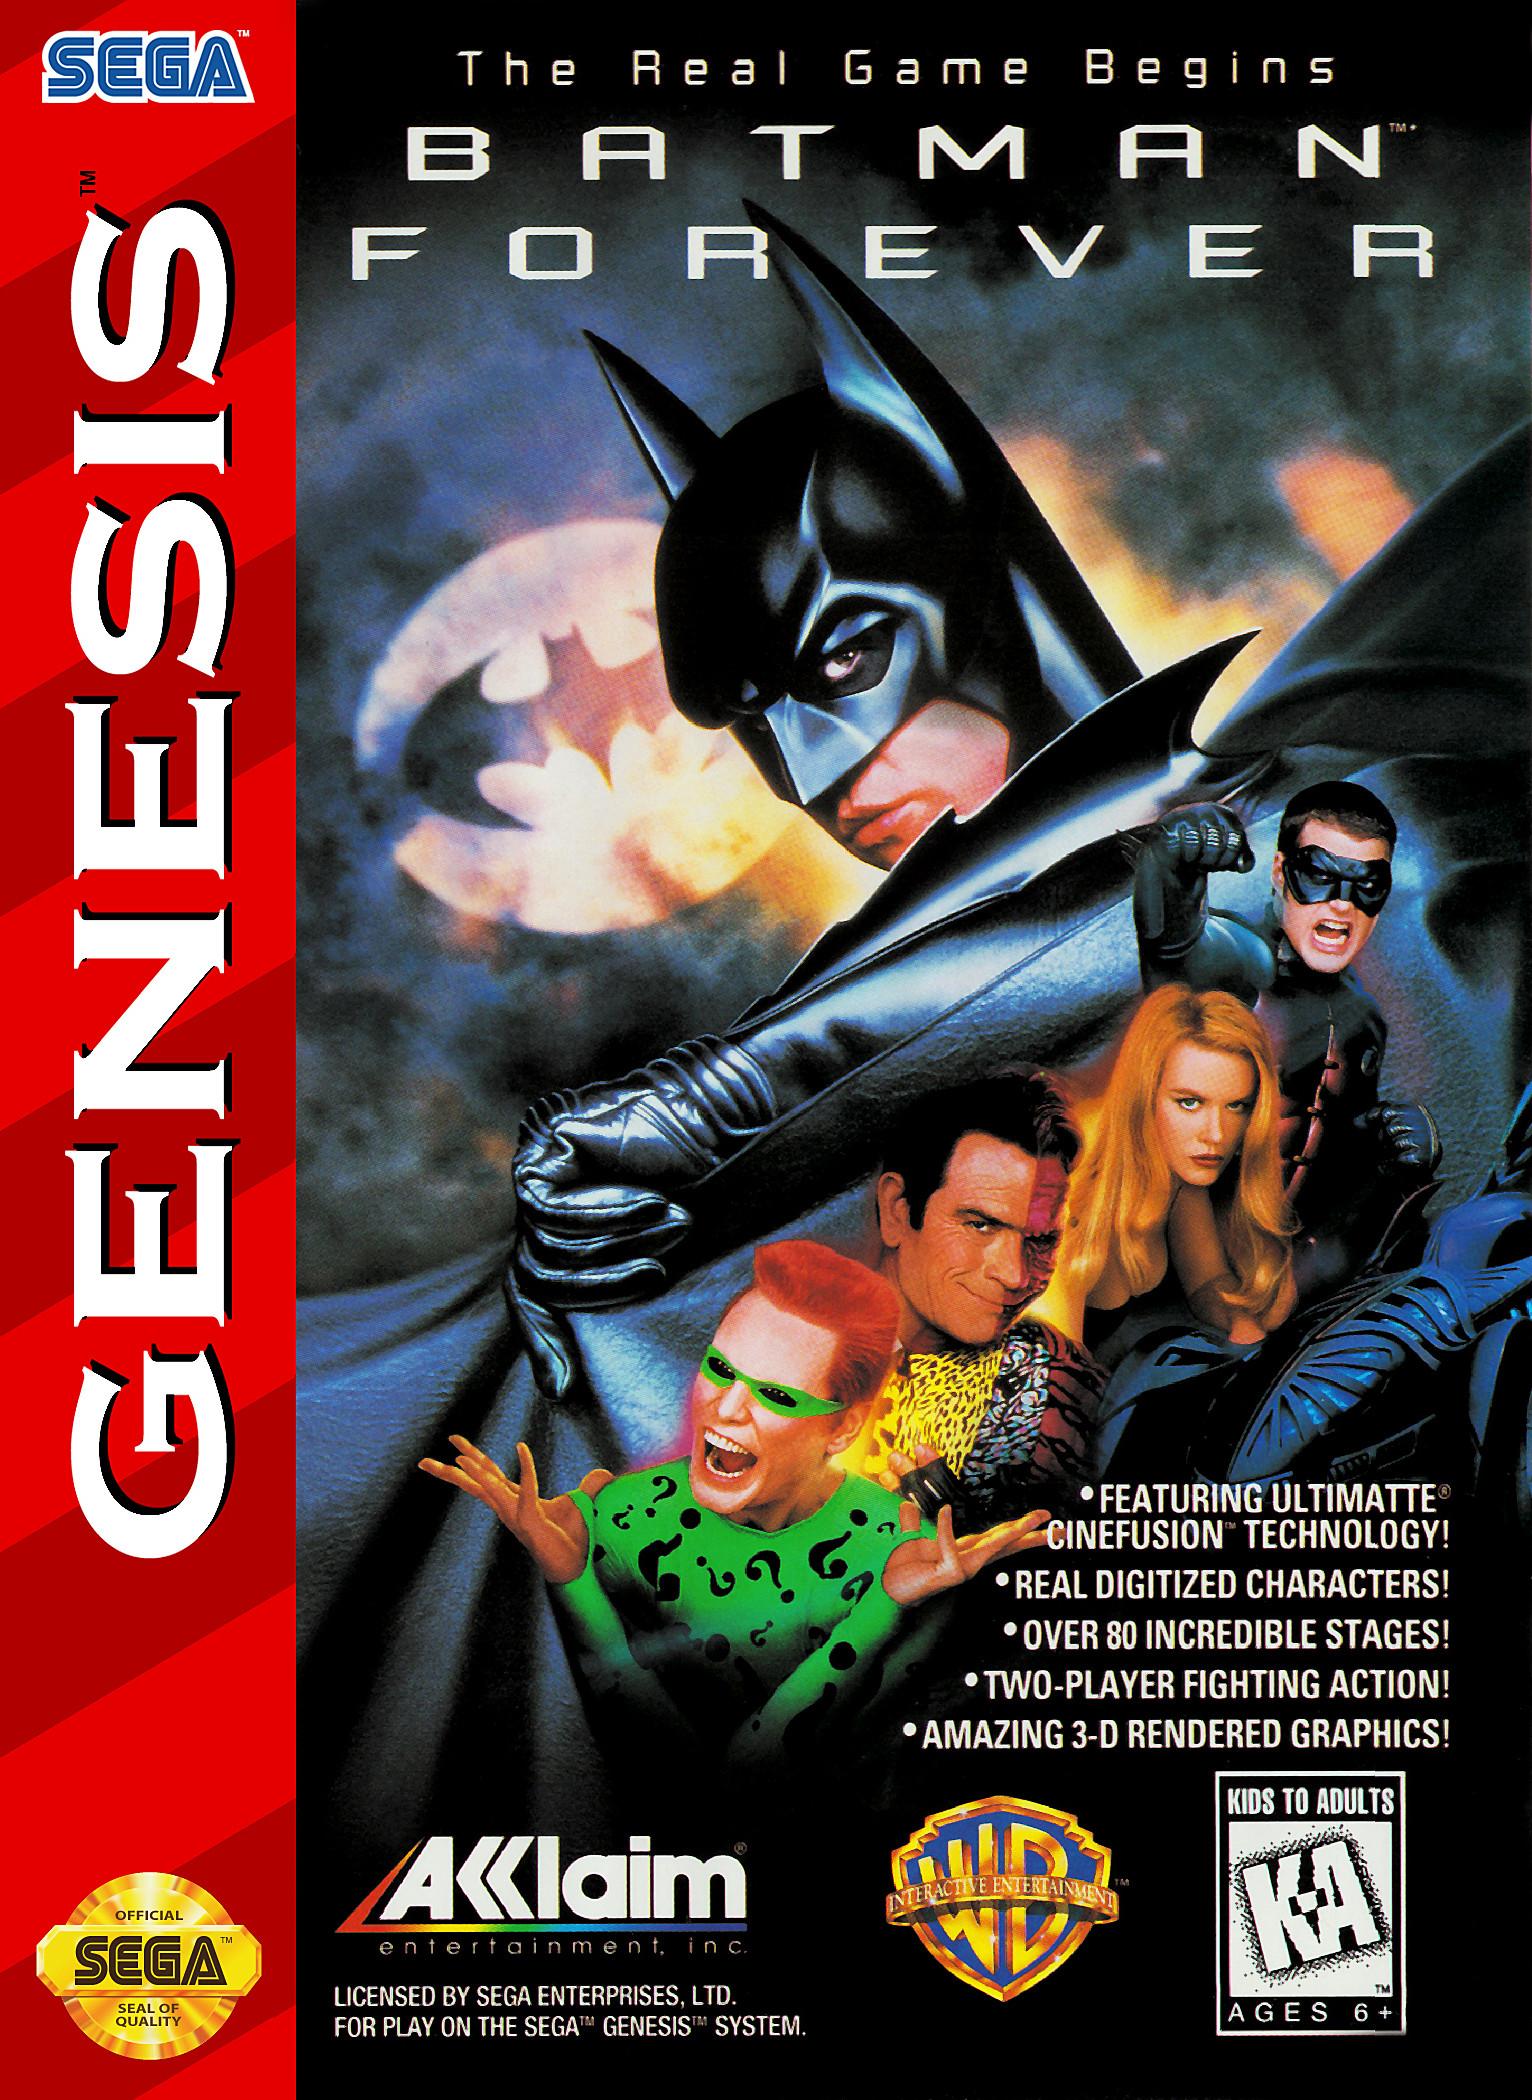 File:BatmanForever Genesis box art.jpg